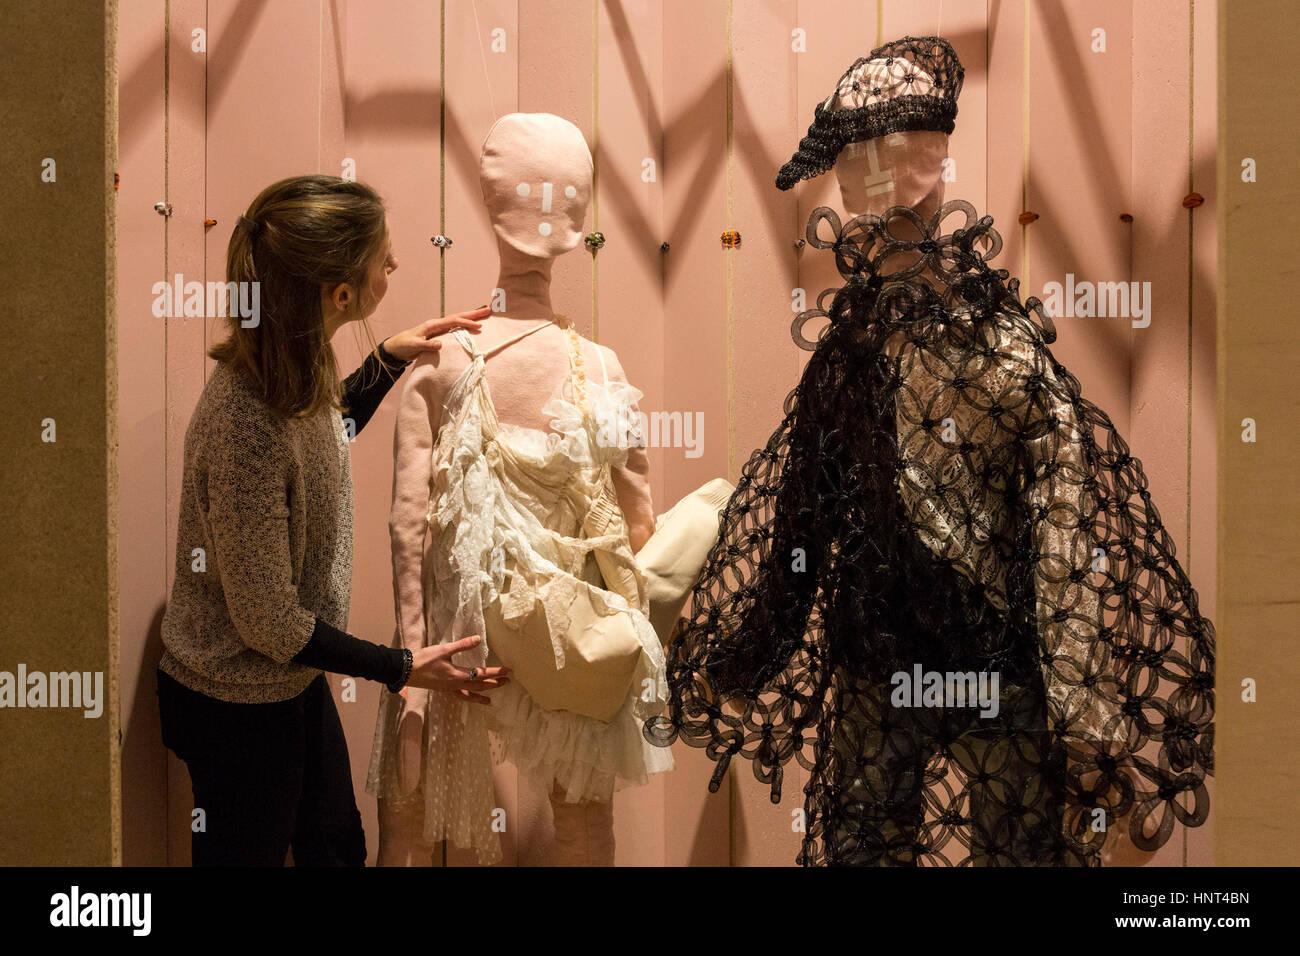 London, UK. 16th Feb, 2017. Pictured: The Polish designers' Kasia Kwiatkowska & Natasza Rogozinska and Anna - Stock Image